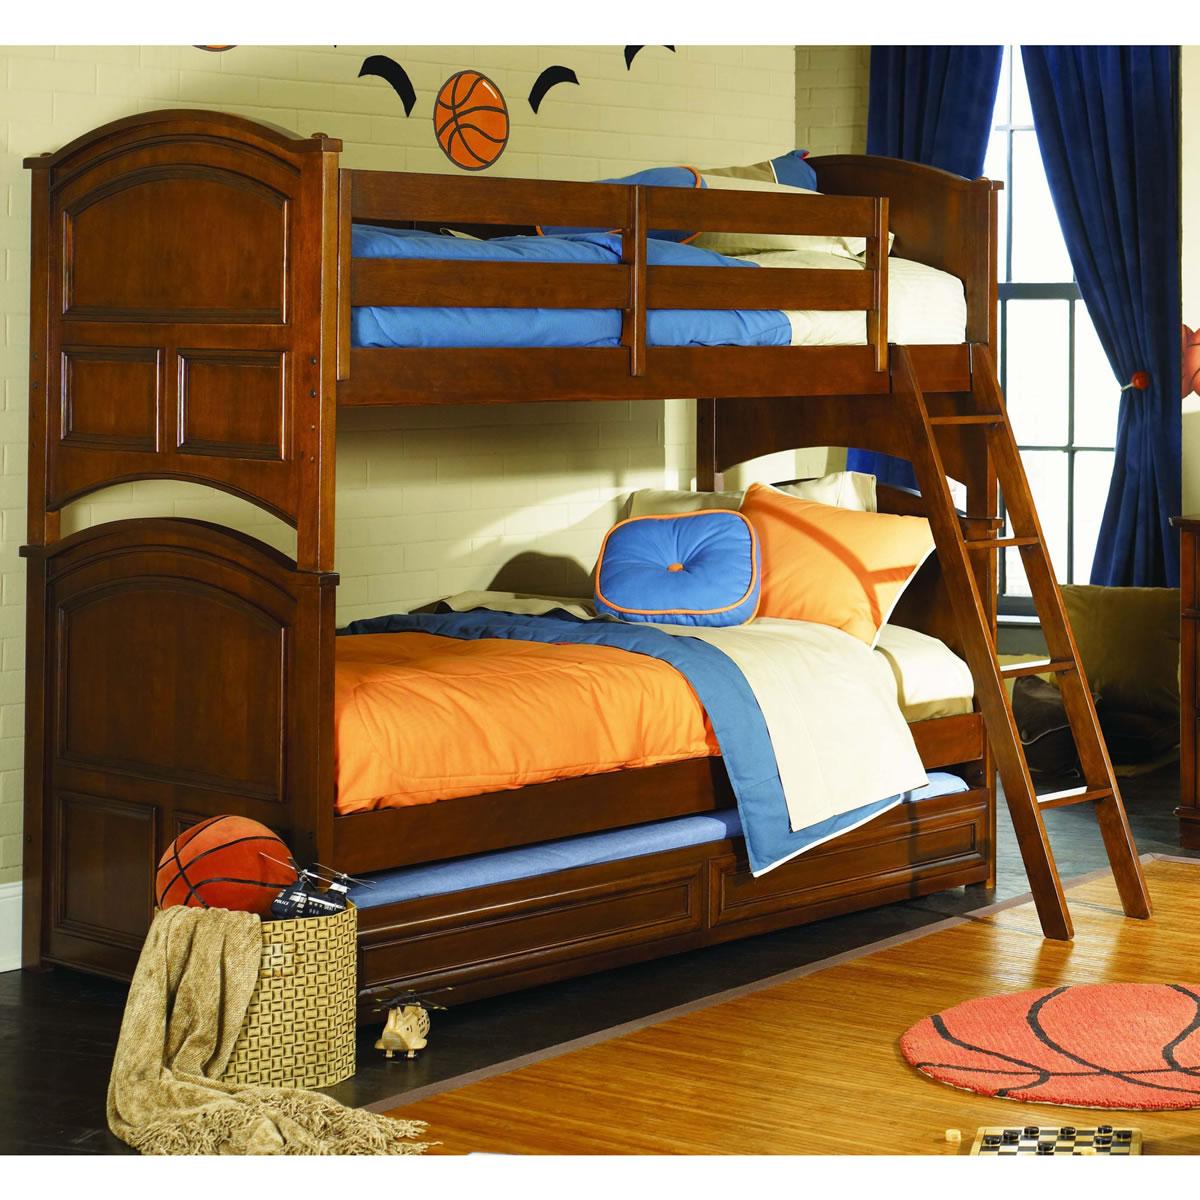 Charmant Bunk Beds HQ